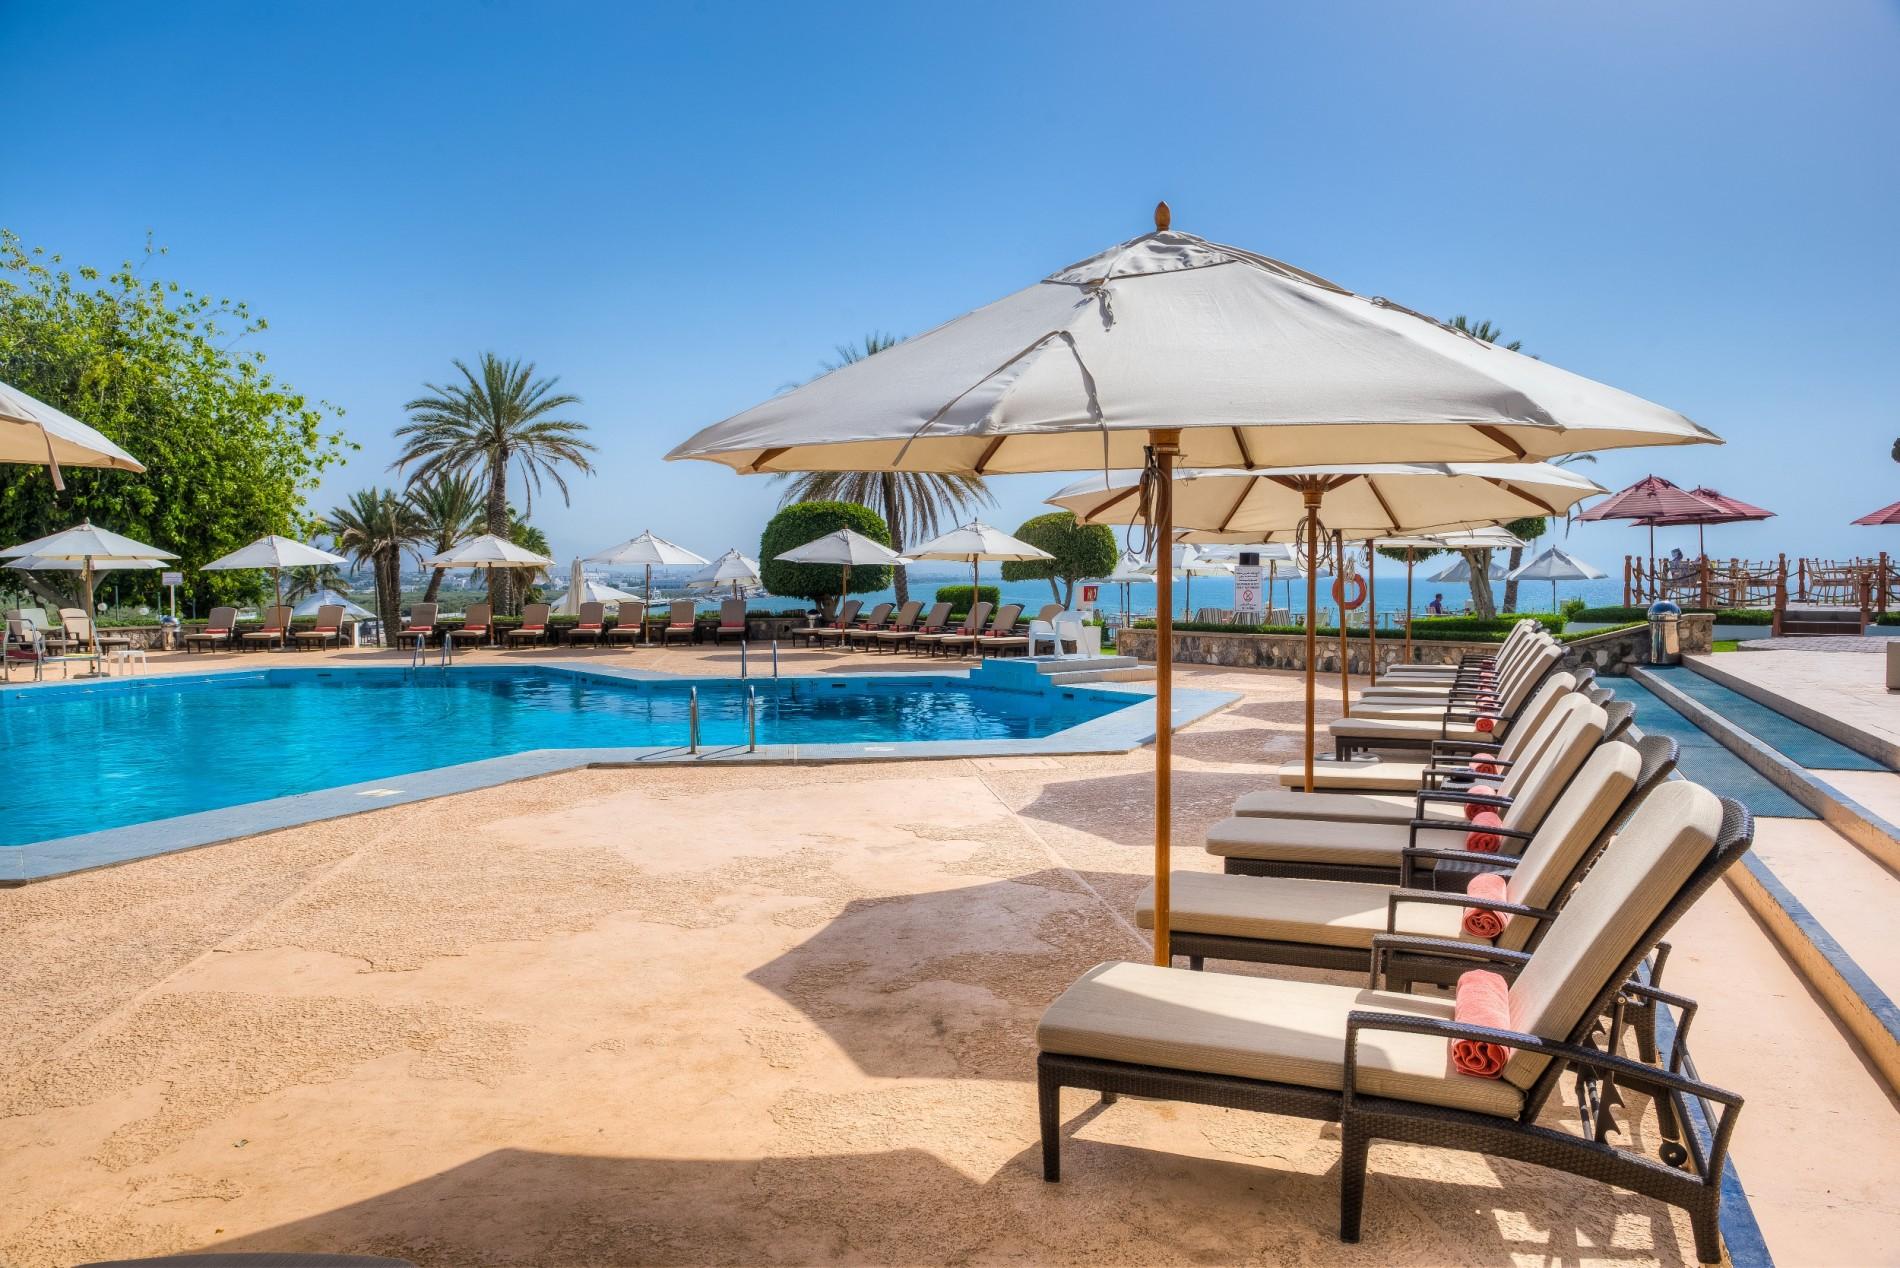 Hotel Crowne plaza muscat zwembad